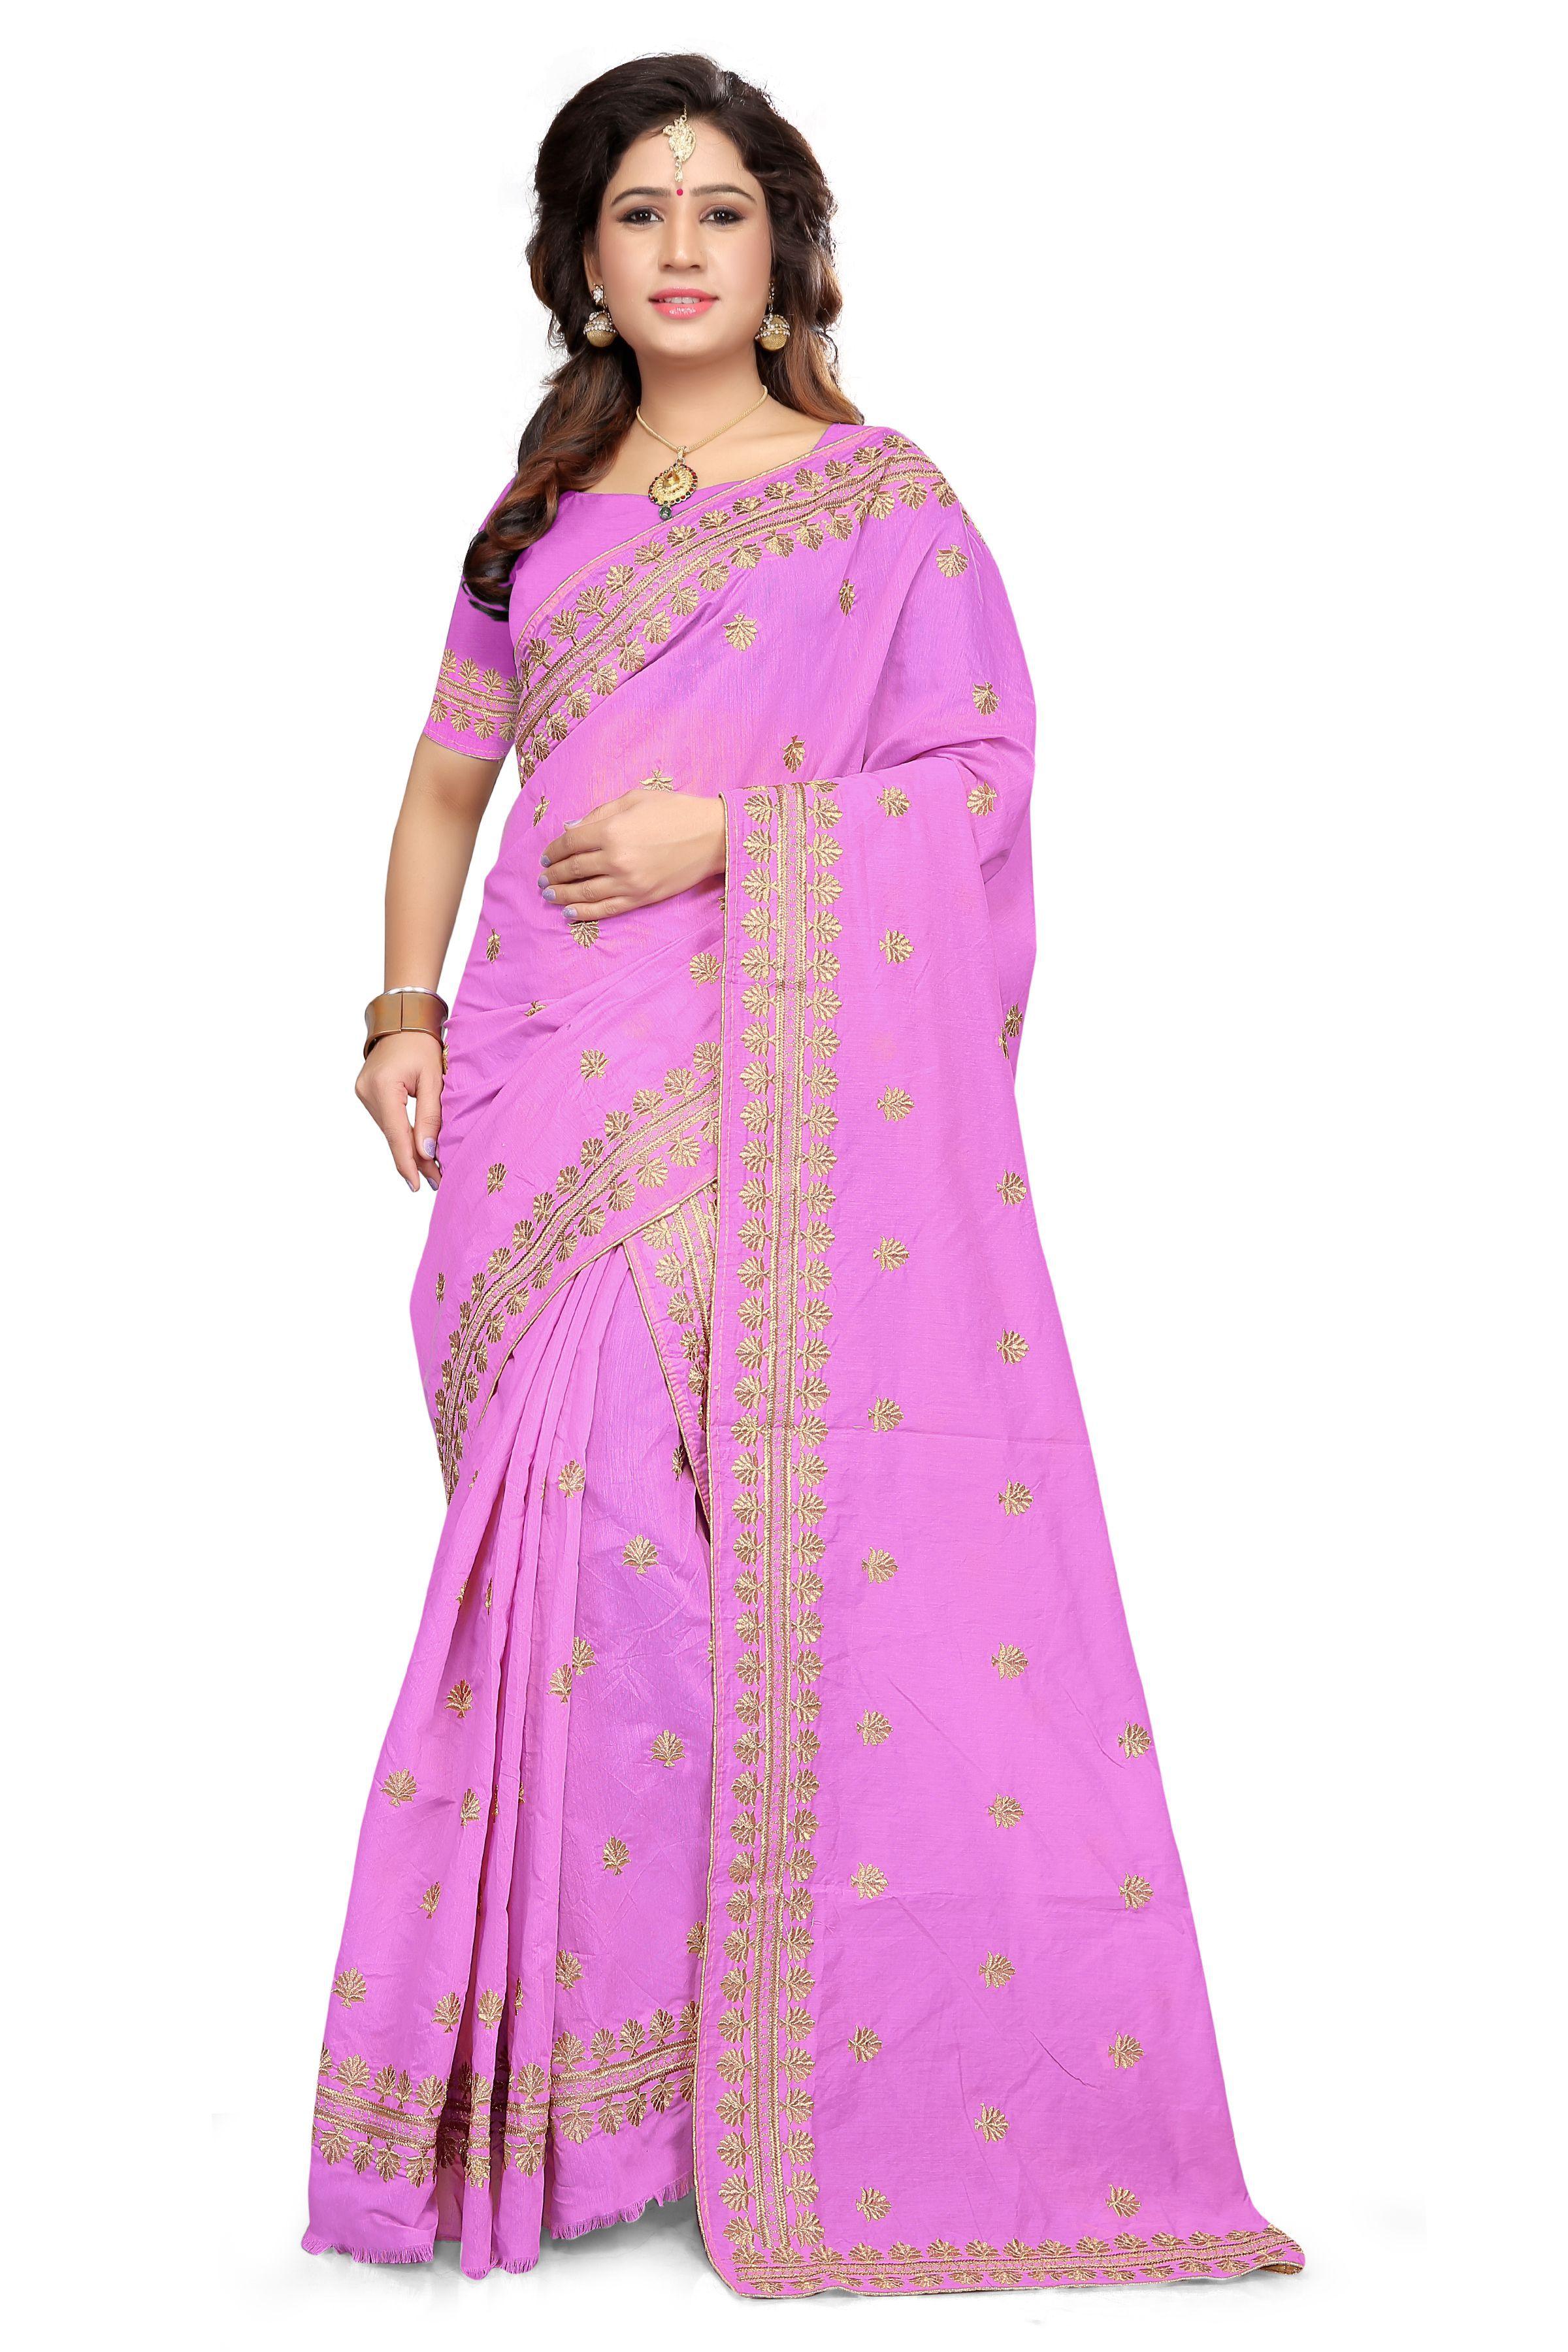 S. Kiran's Purple Cotton Poly Mekhla Chador Saree